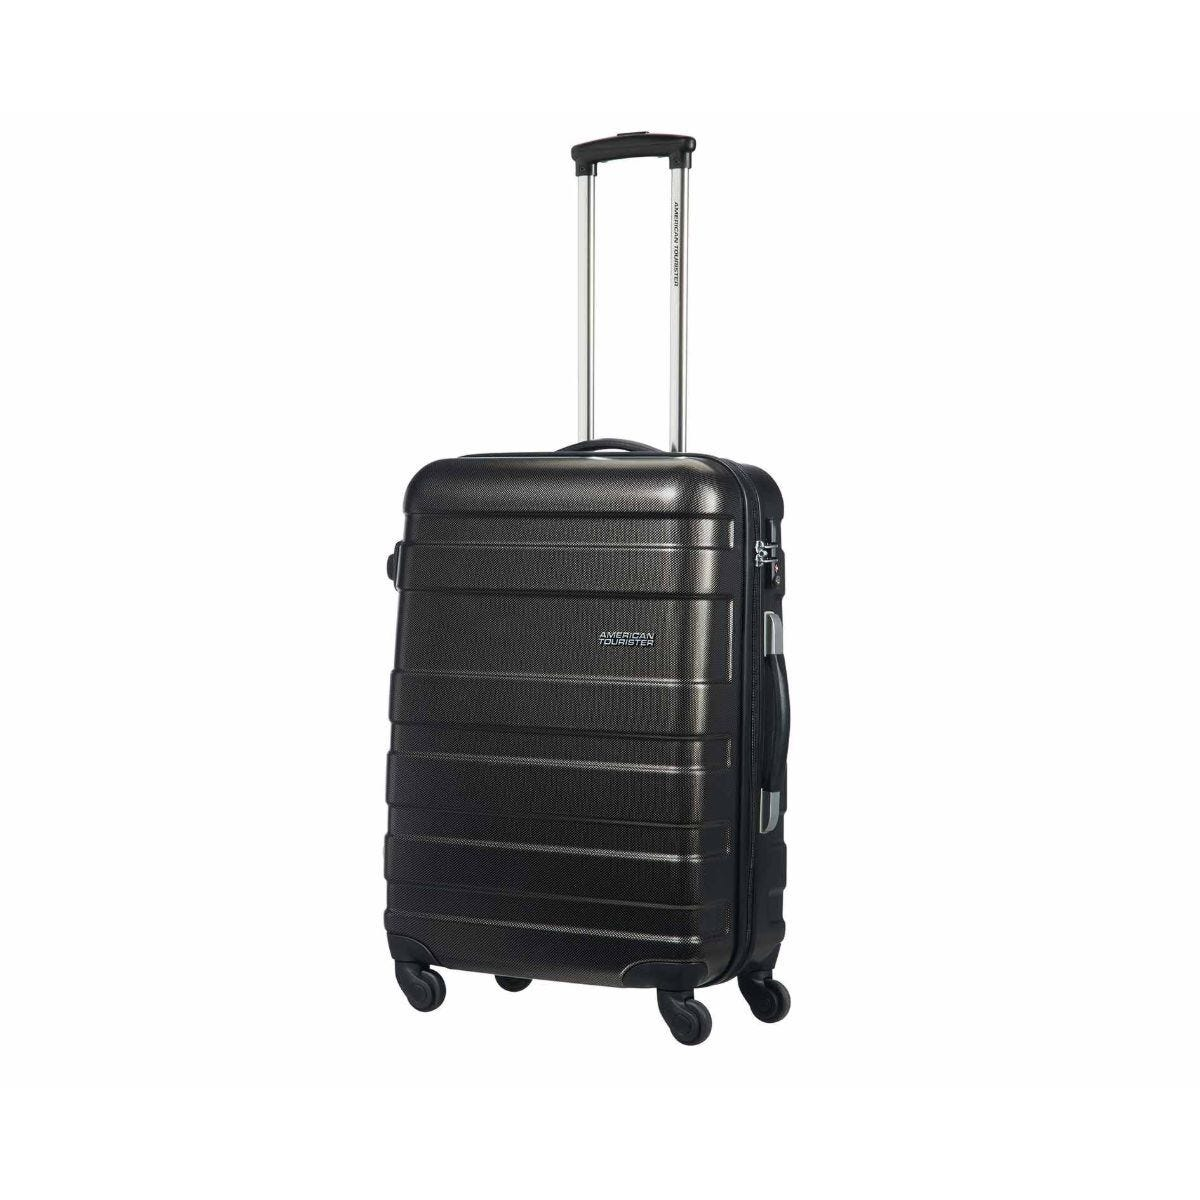 American Tourister Pasadena 4 Wheel Medium Suitcase Black